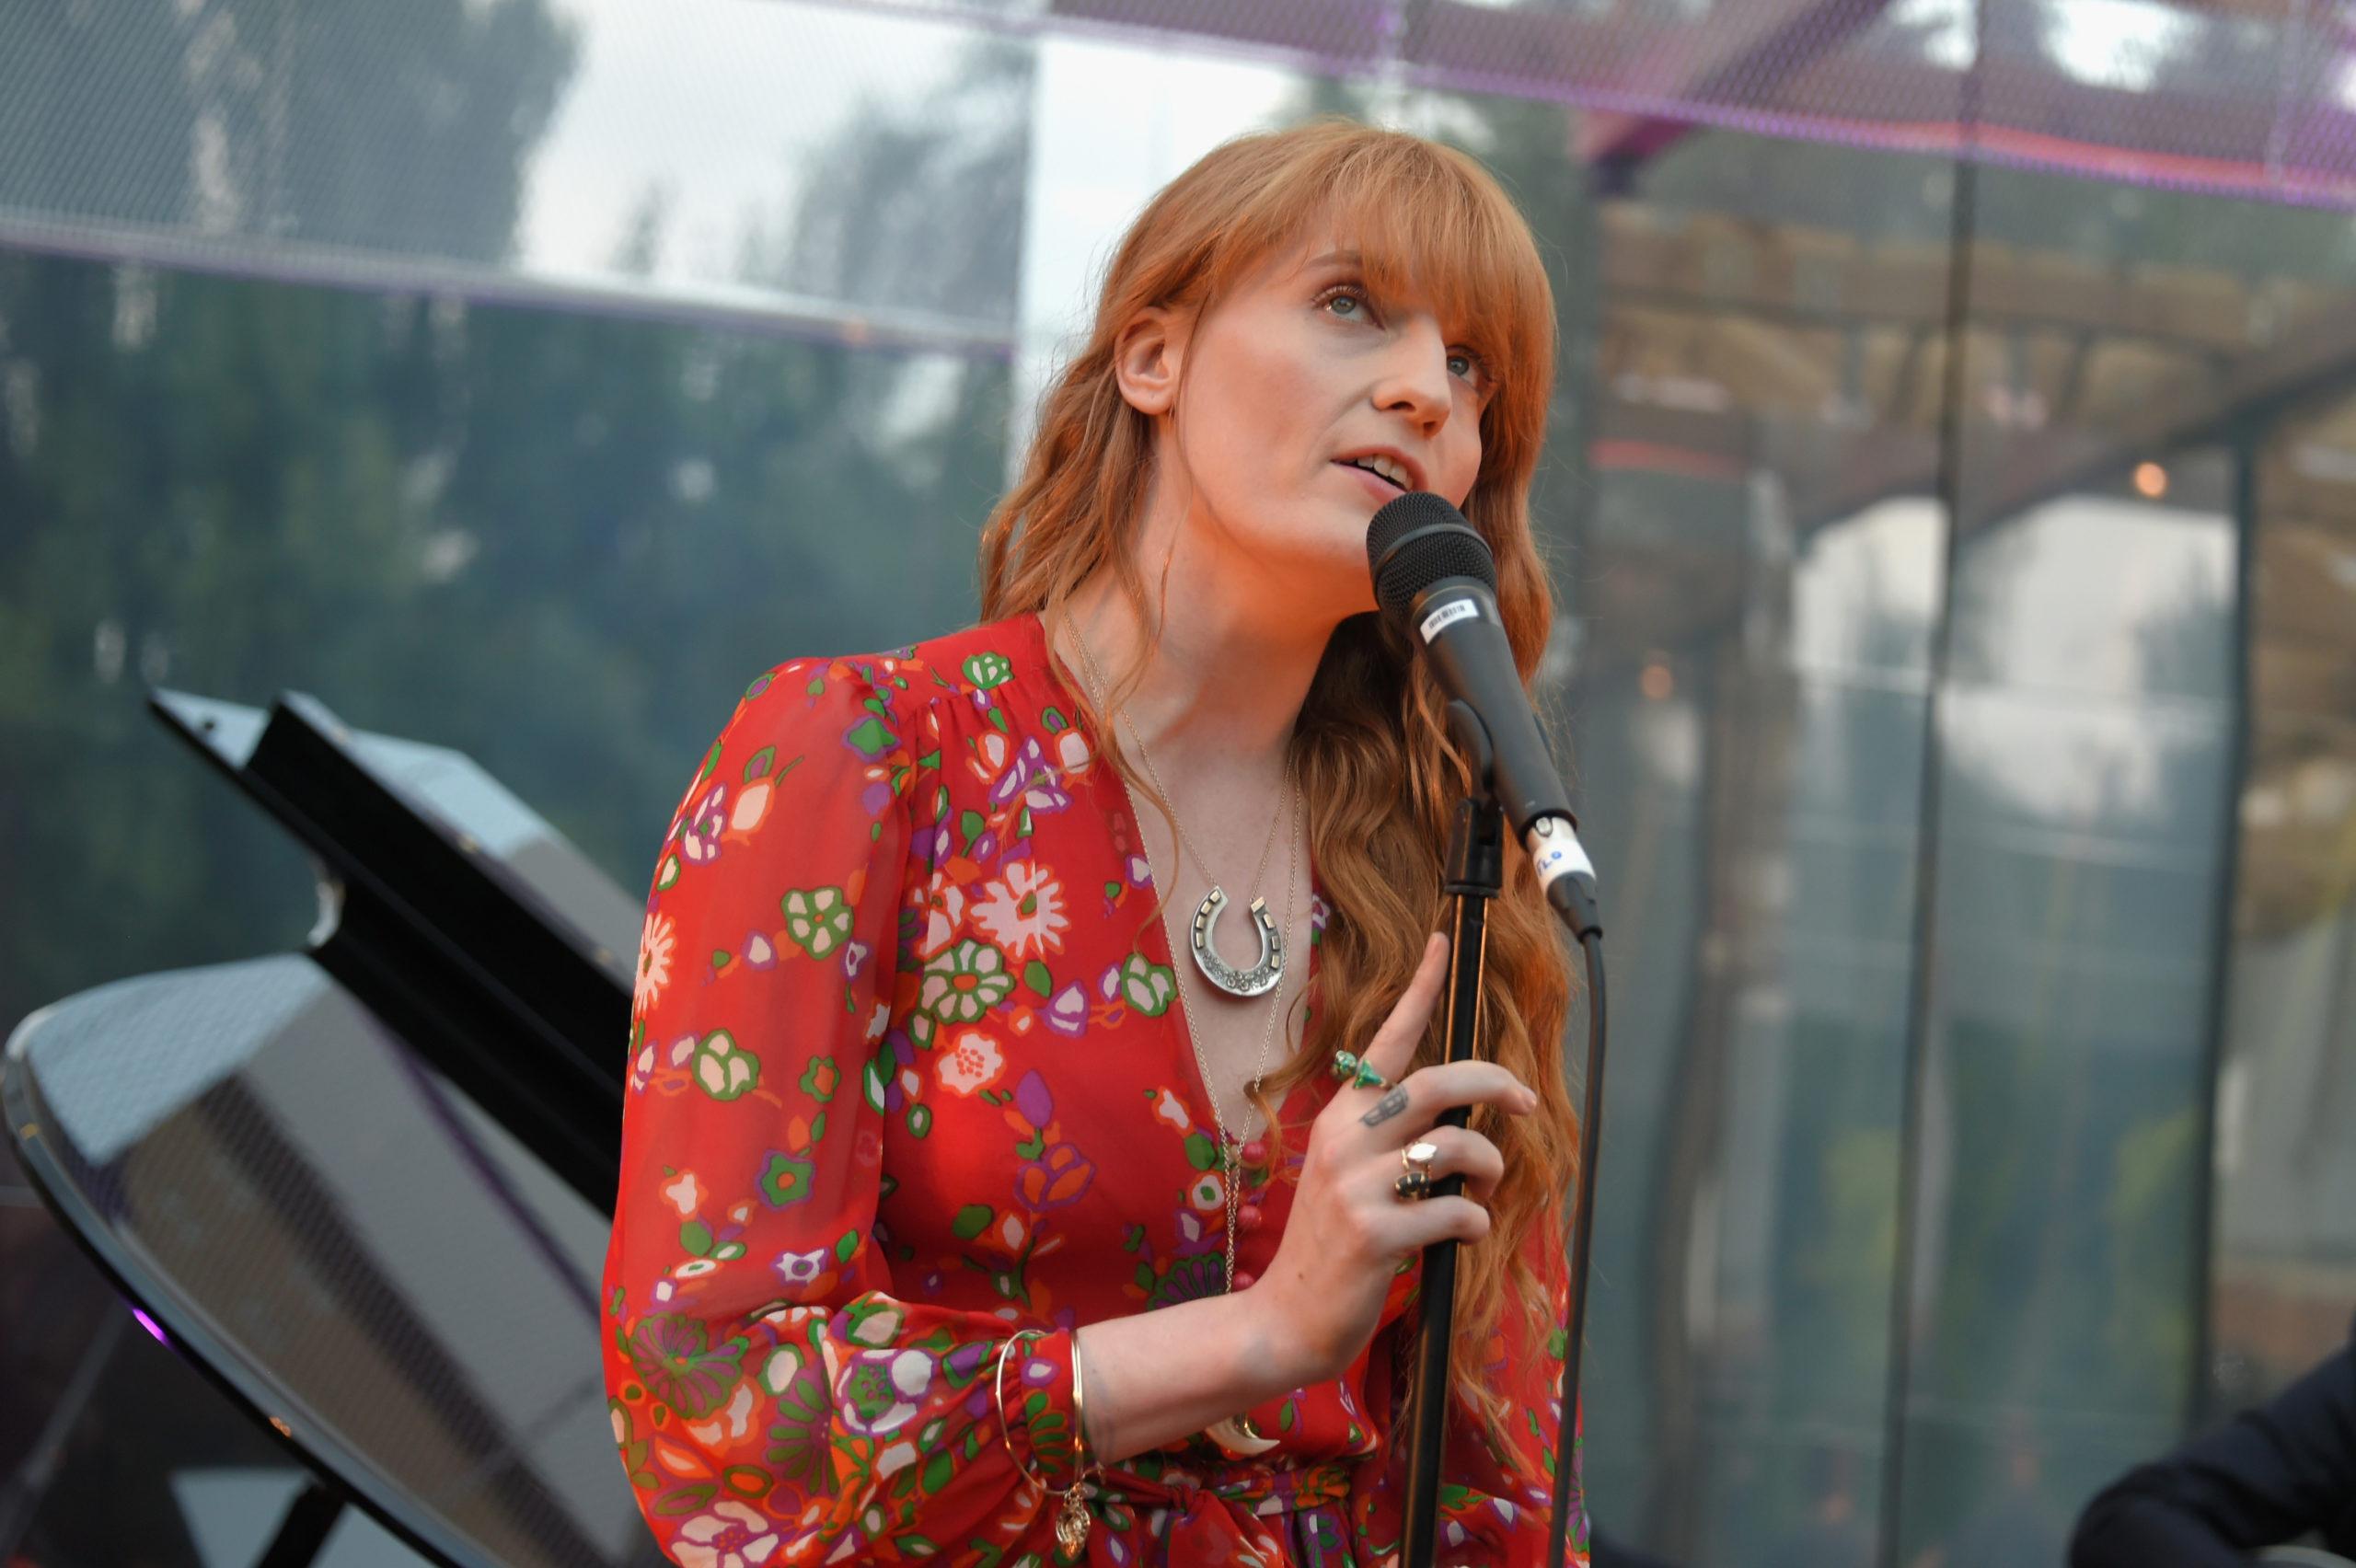 Accordi Florence and the Machine